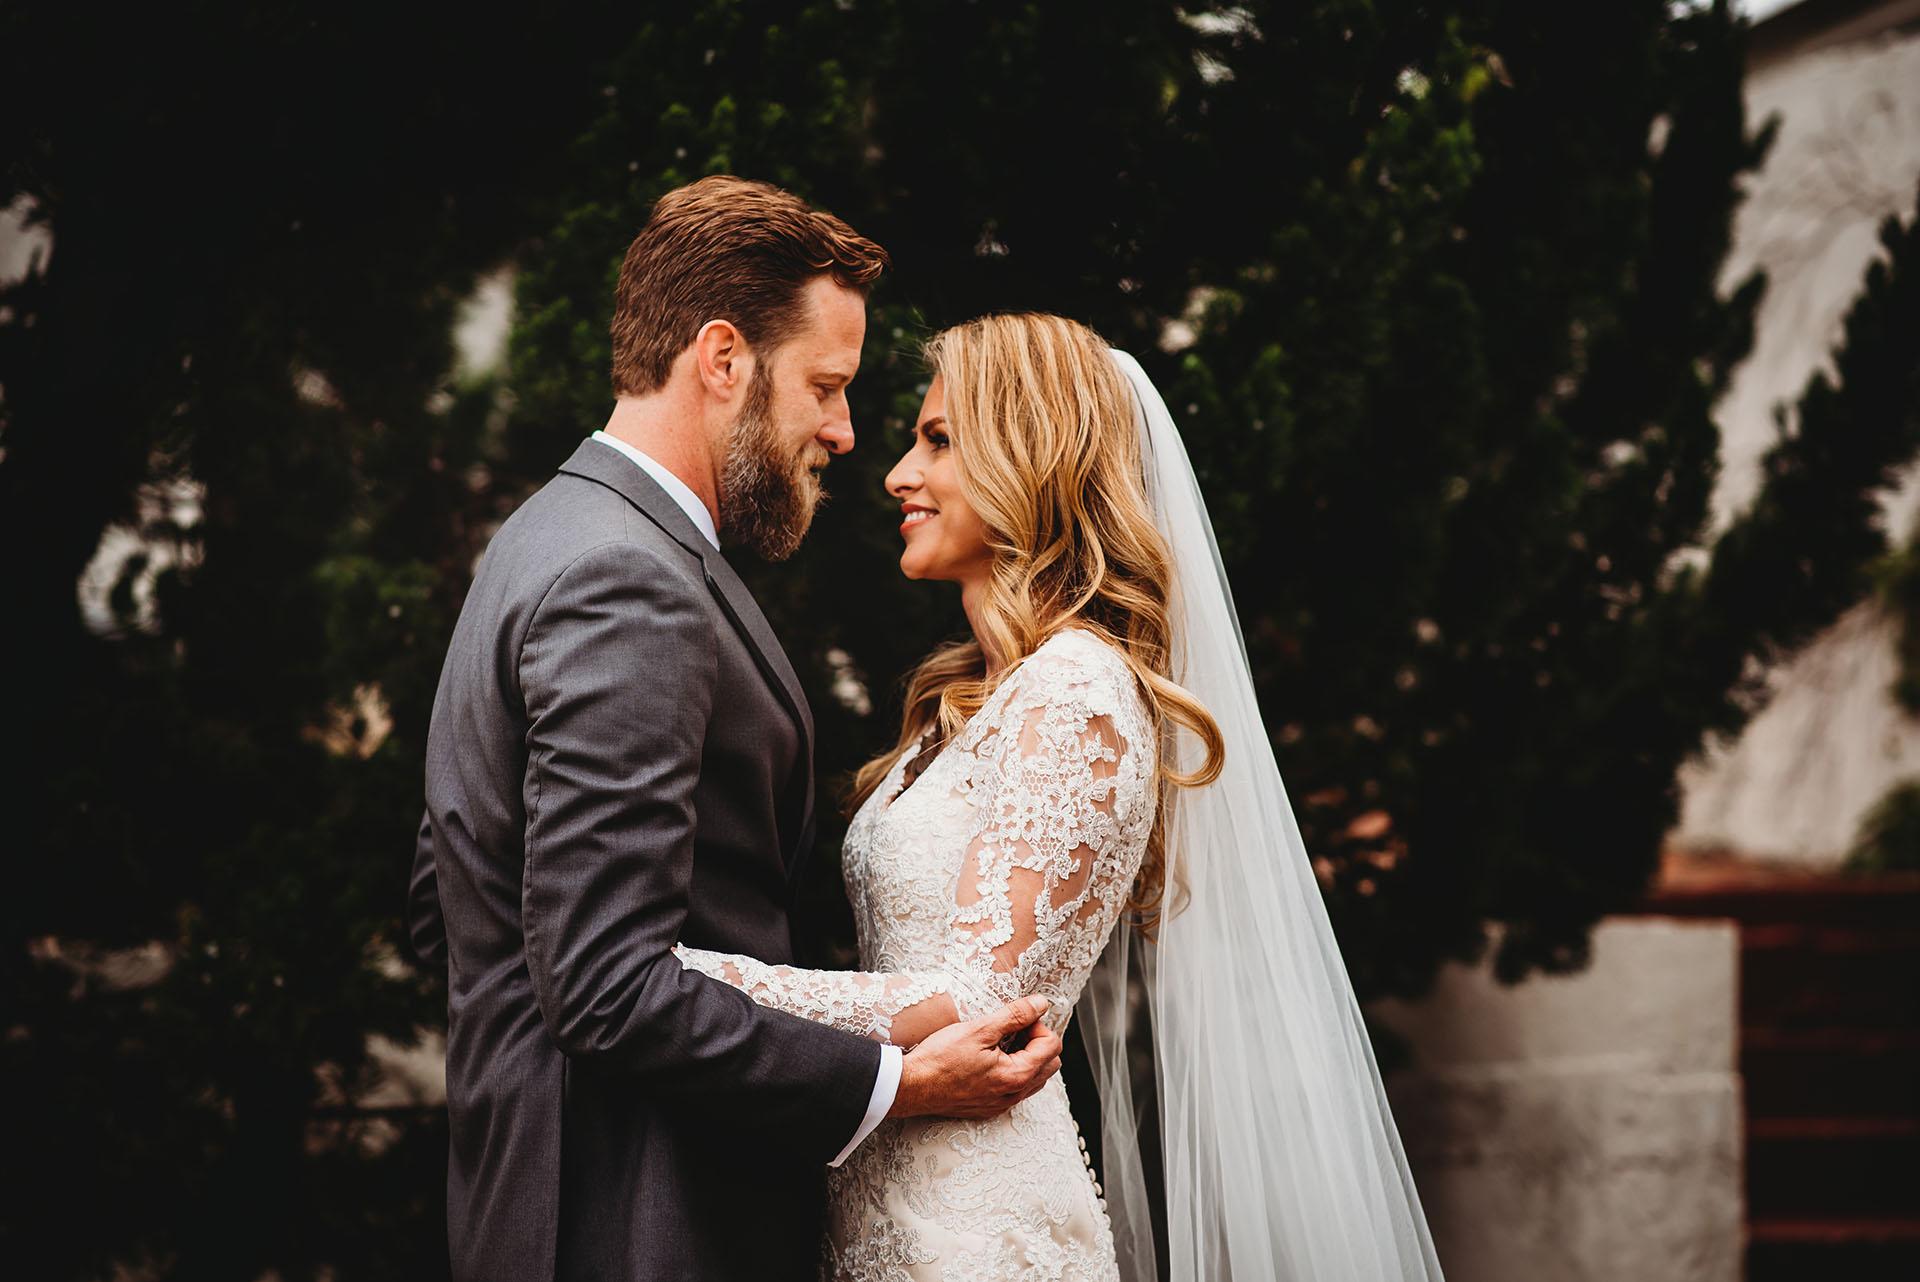 wedding (1 of 1)-1q11.jpg